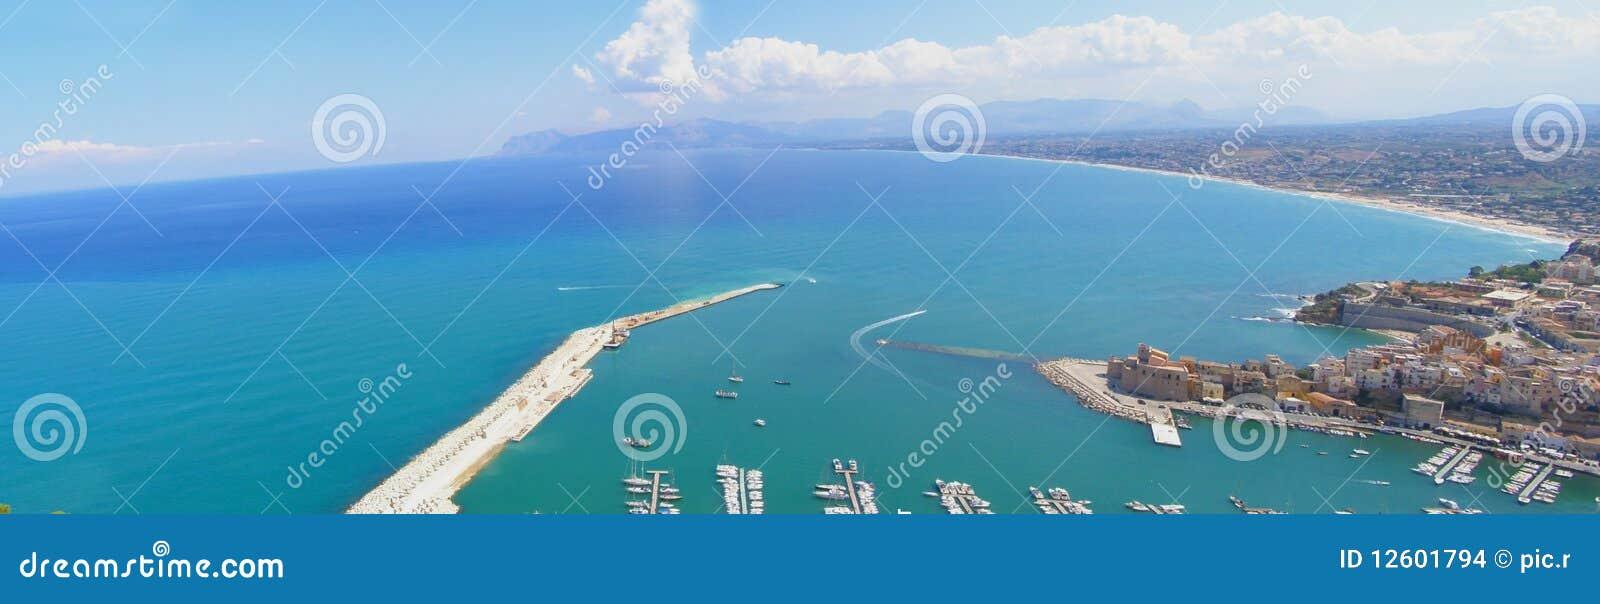 Küstestadtpanorama